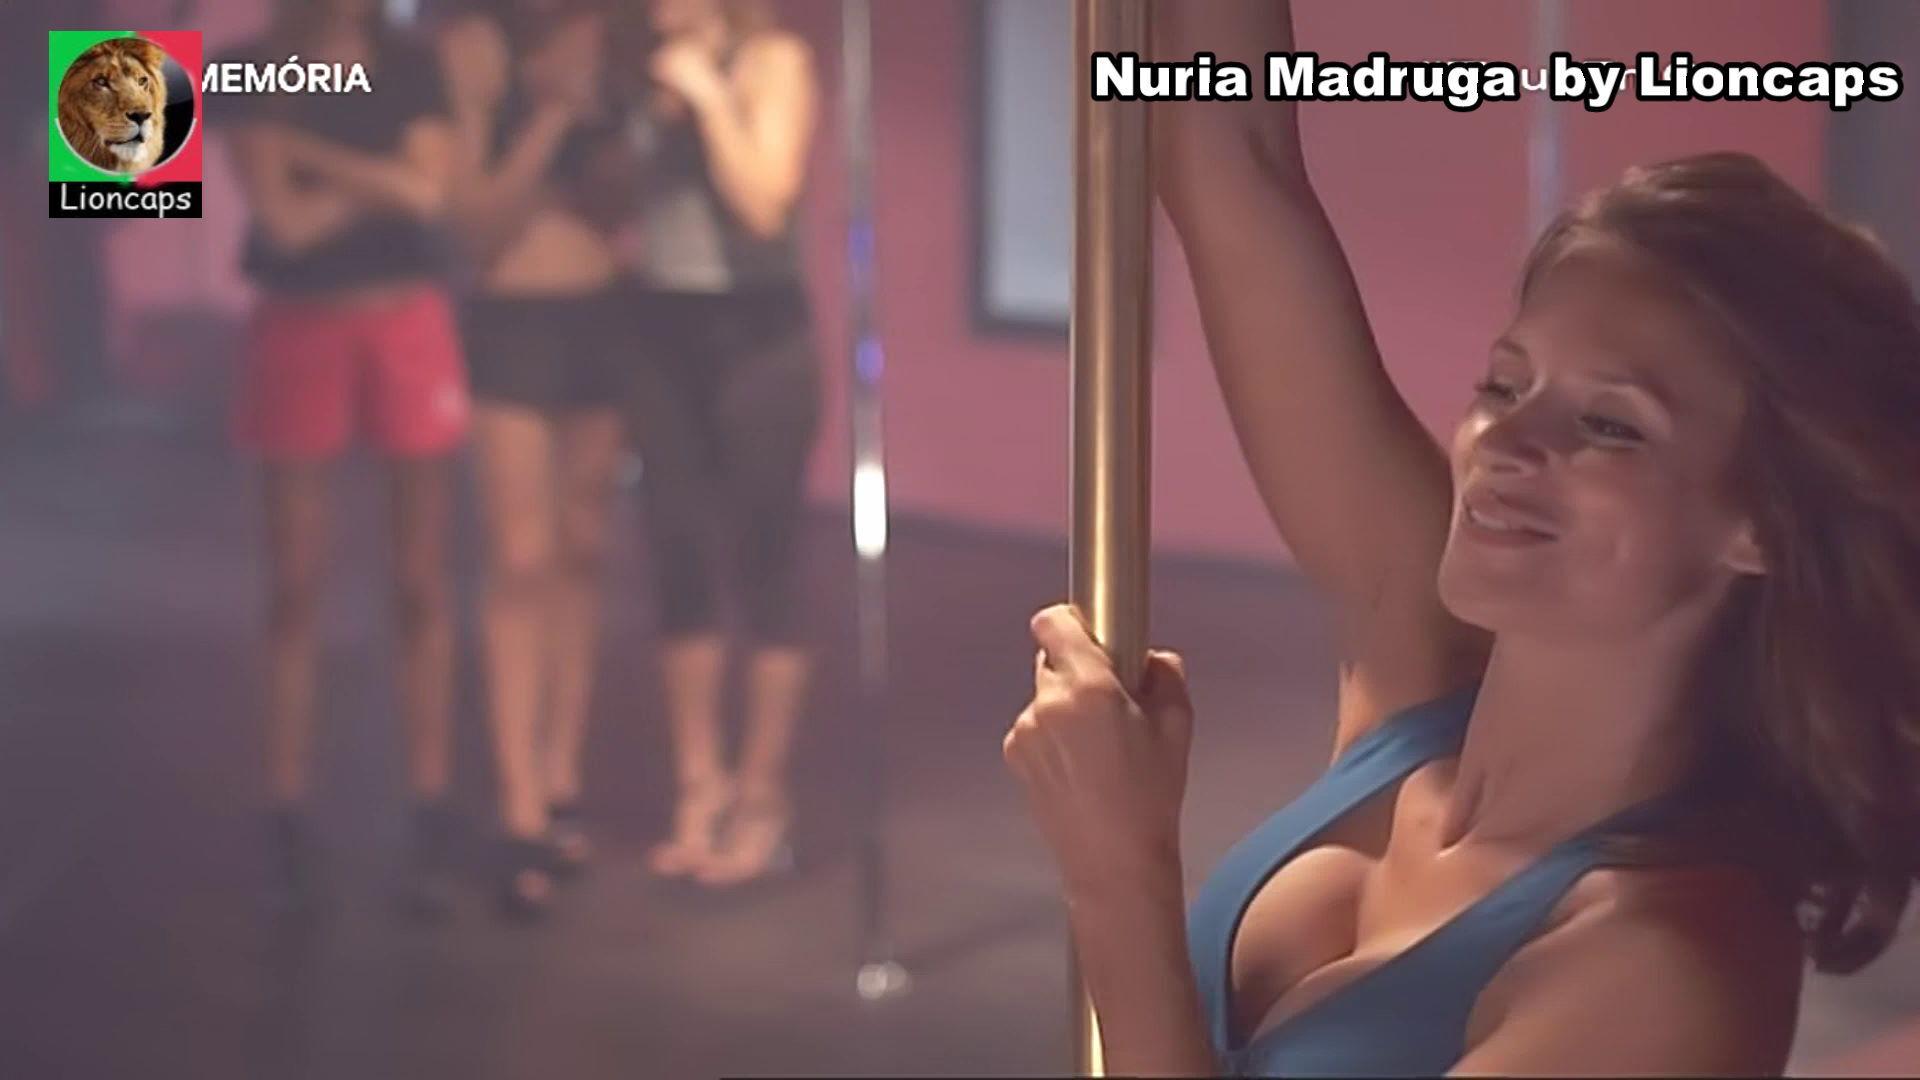 nuria_madruga_vs200421-001 (4).JPG